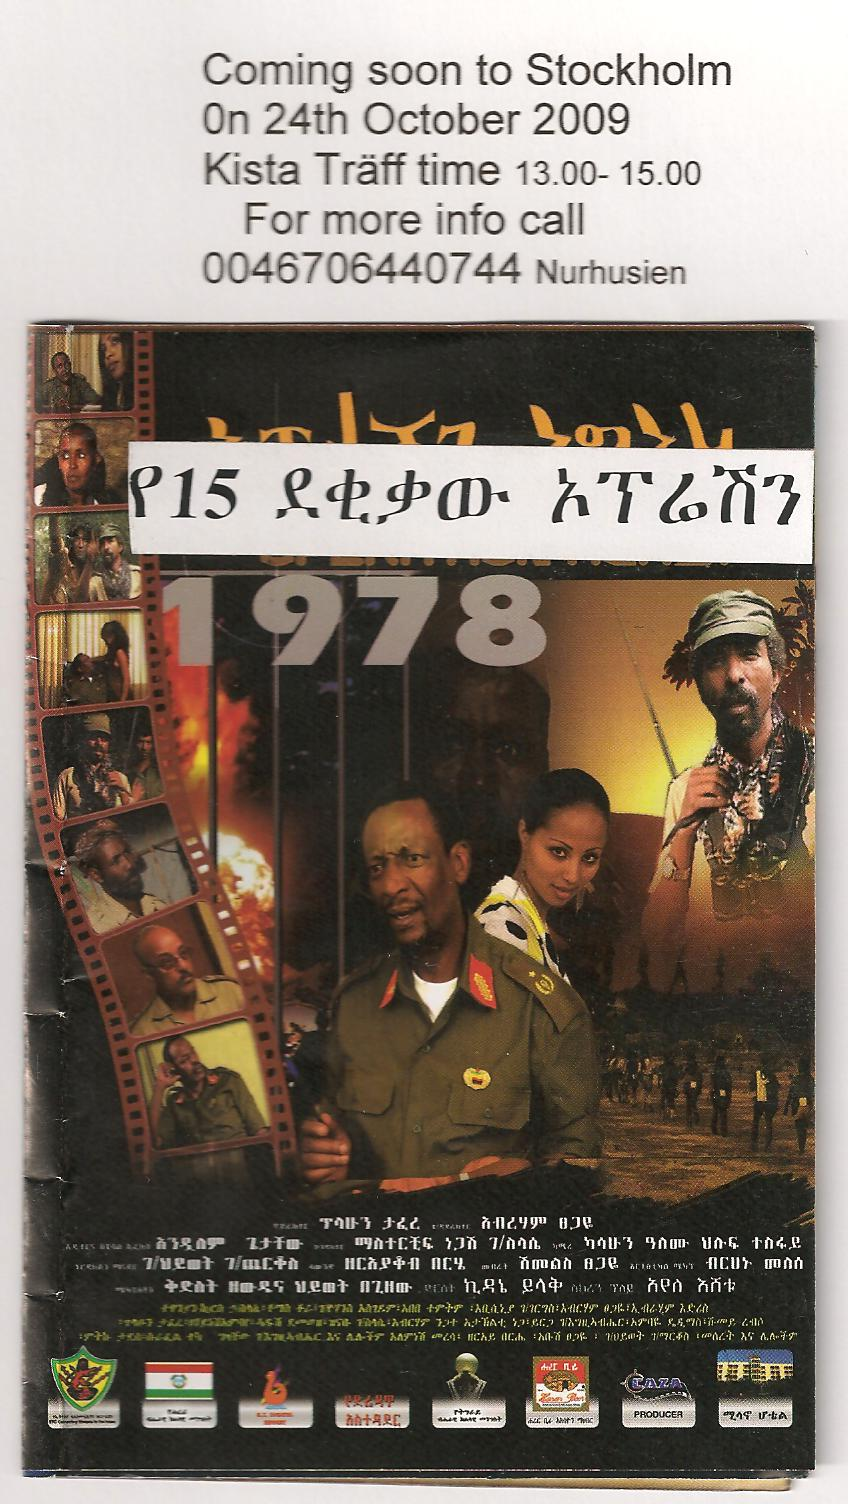 Meles Zenawi Daughter http://www.pic2fly.com/Ethiomedia+Meles+Zenawi